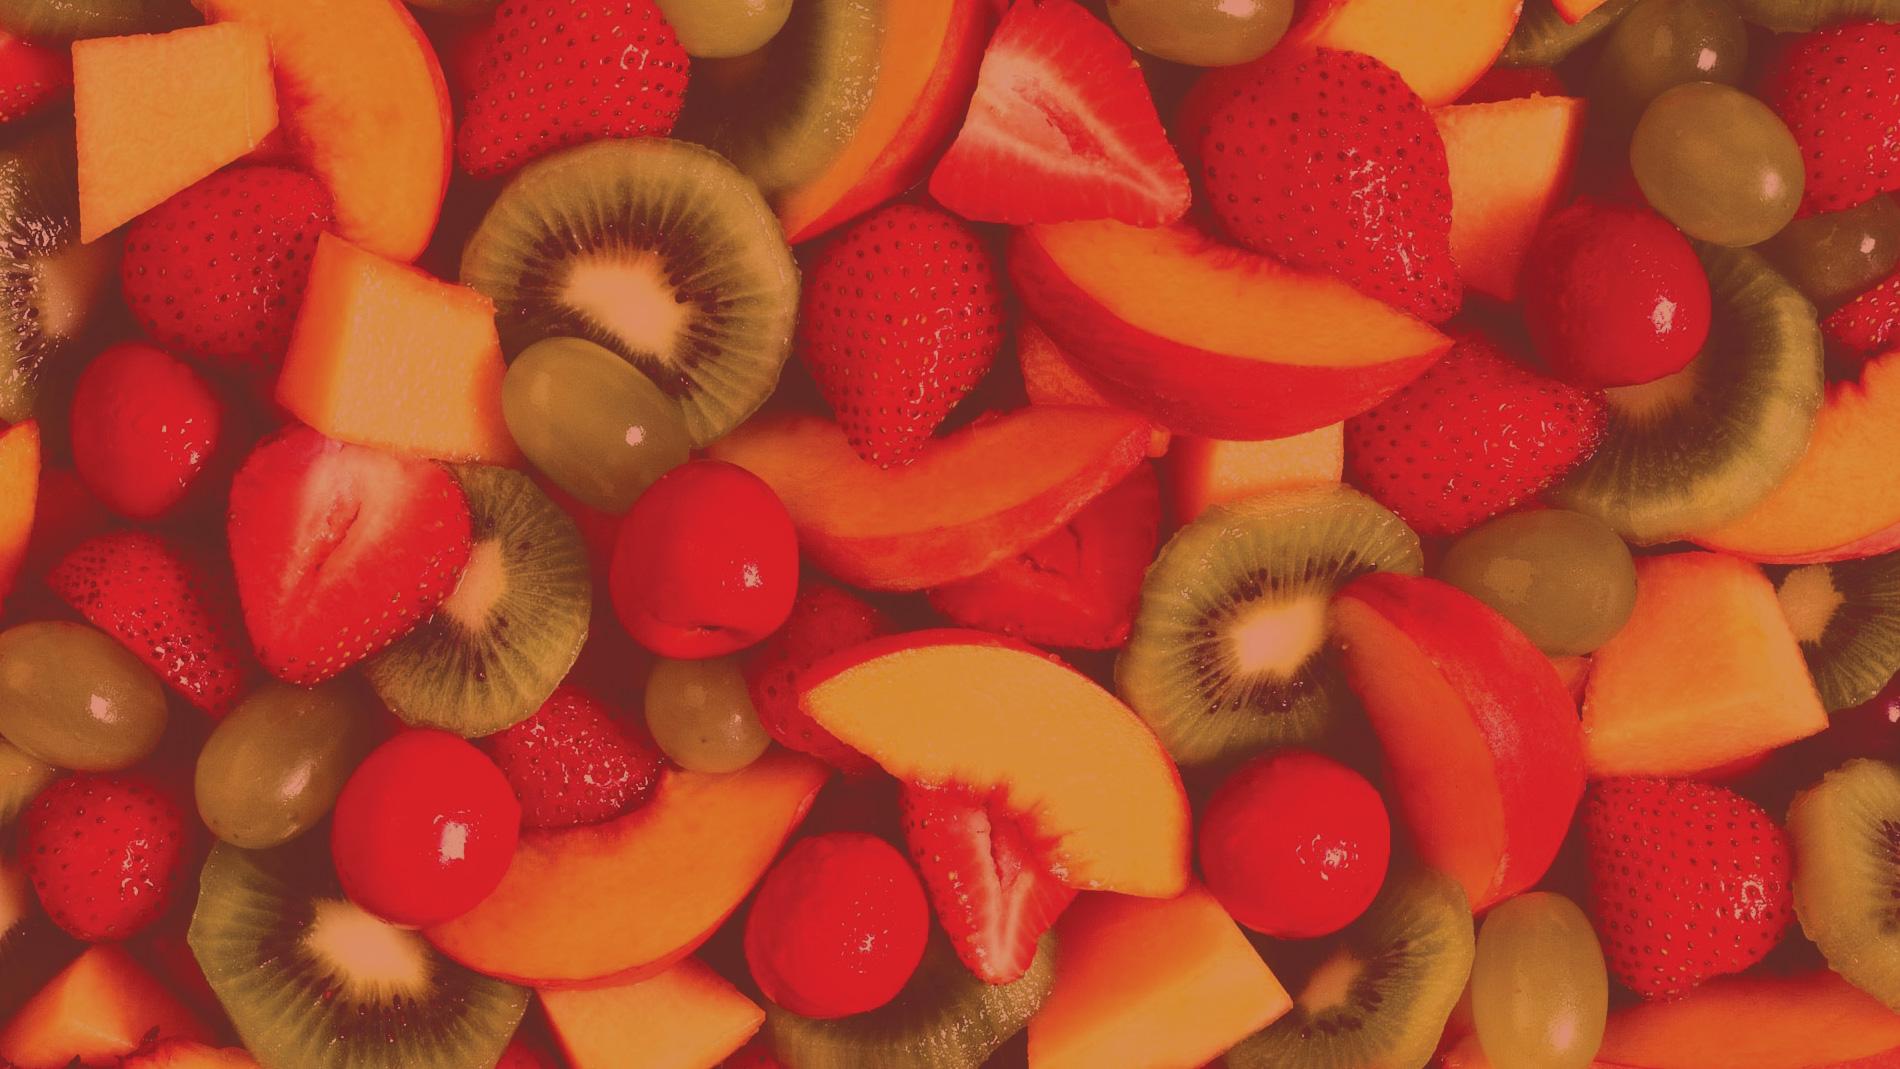 Praktijk voor voedings- en dieetadvisering